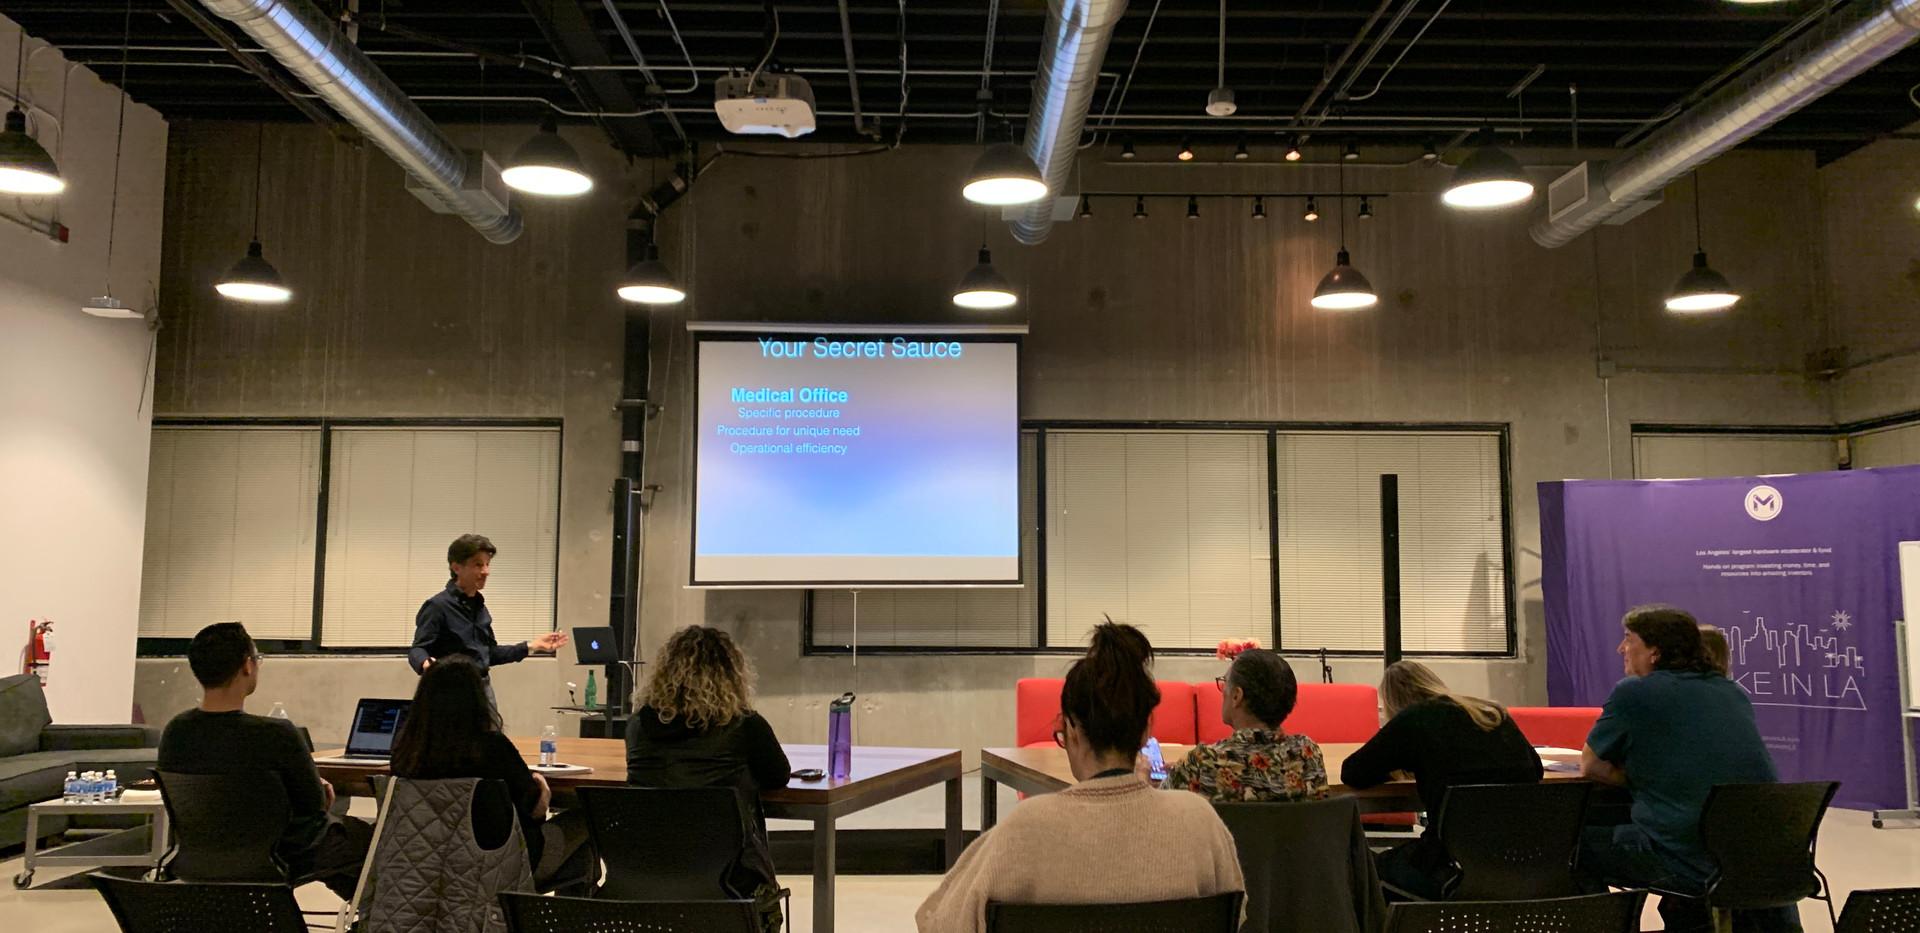 marketingbootcamp 64.jpg